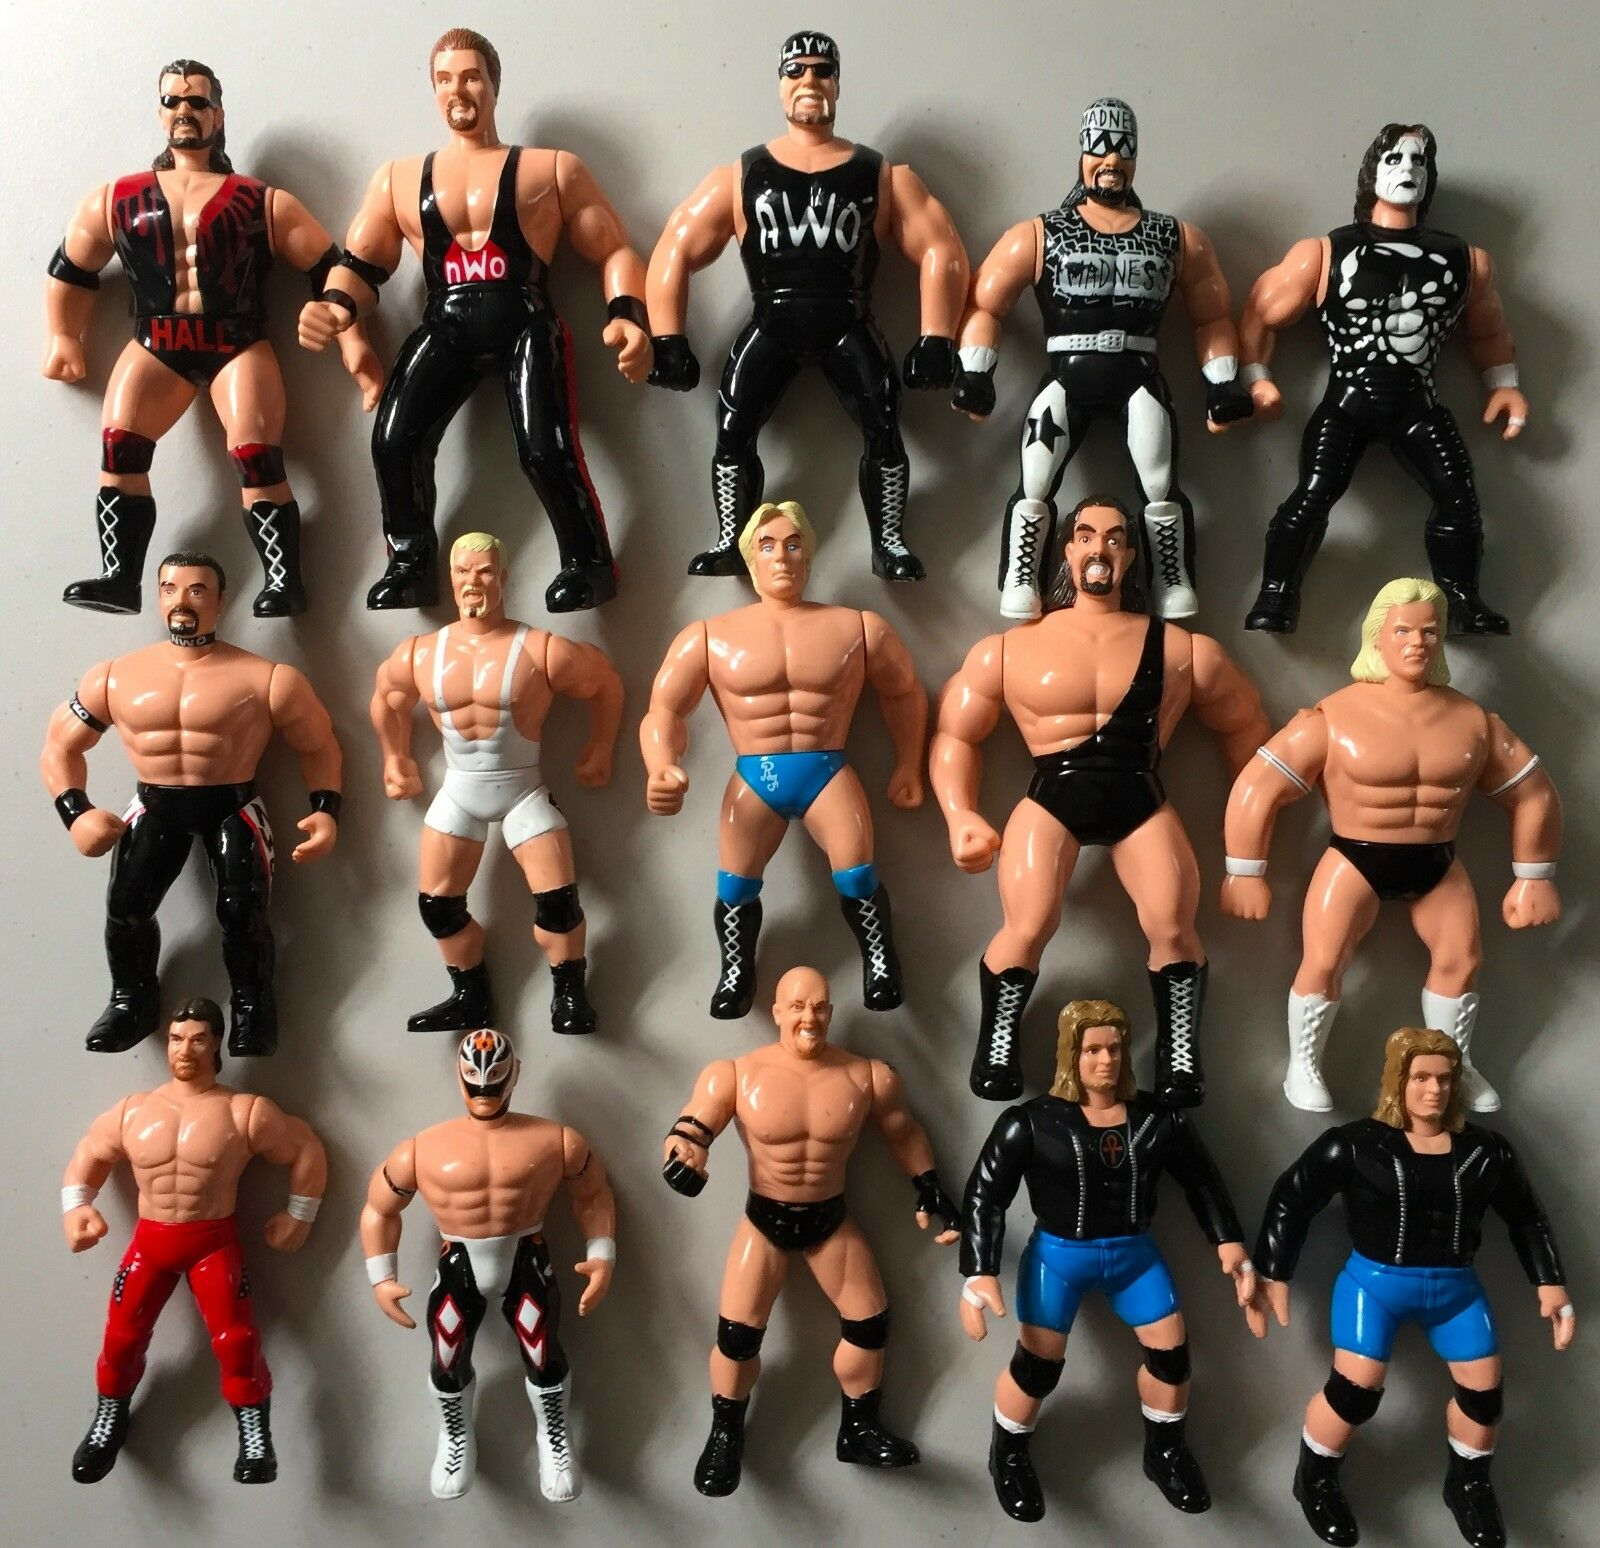 15 WCW Wrestling Figures HALL NASH HOGAN SAVAGE STING FLAIR goldBERG NWO WWF WWE